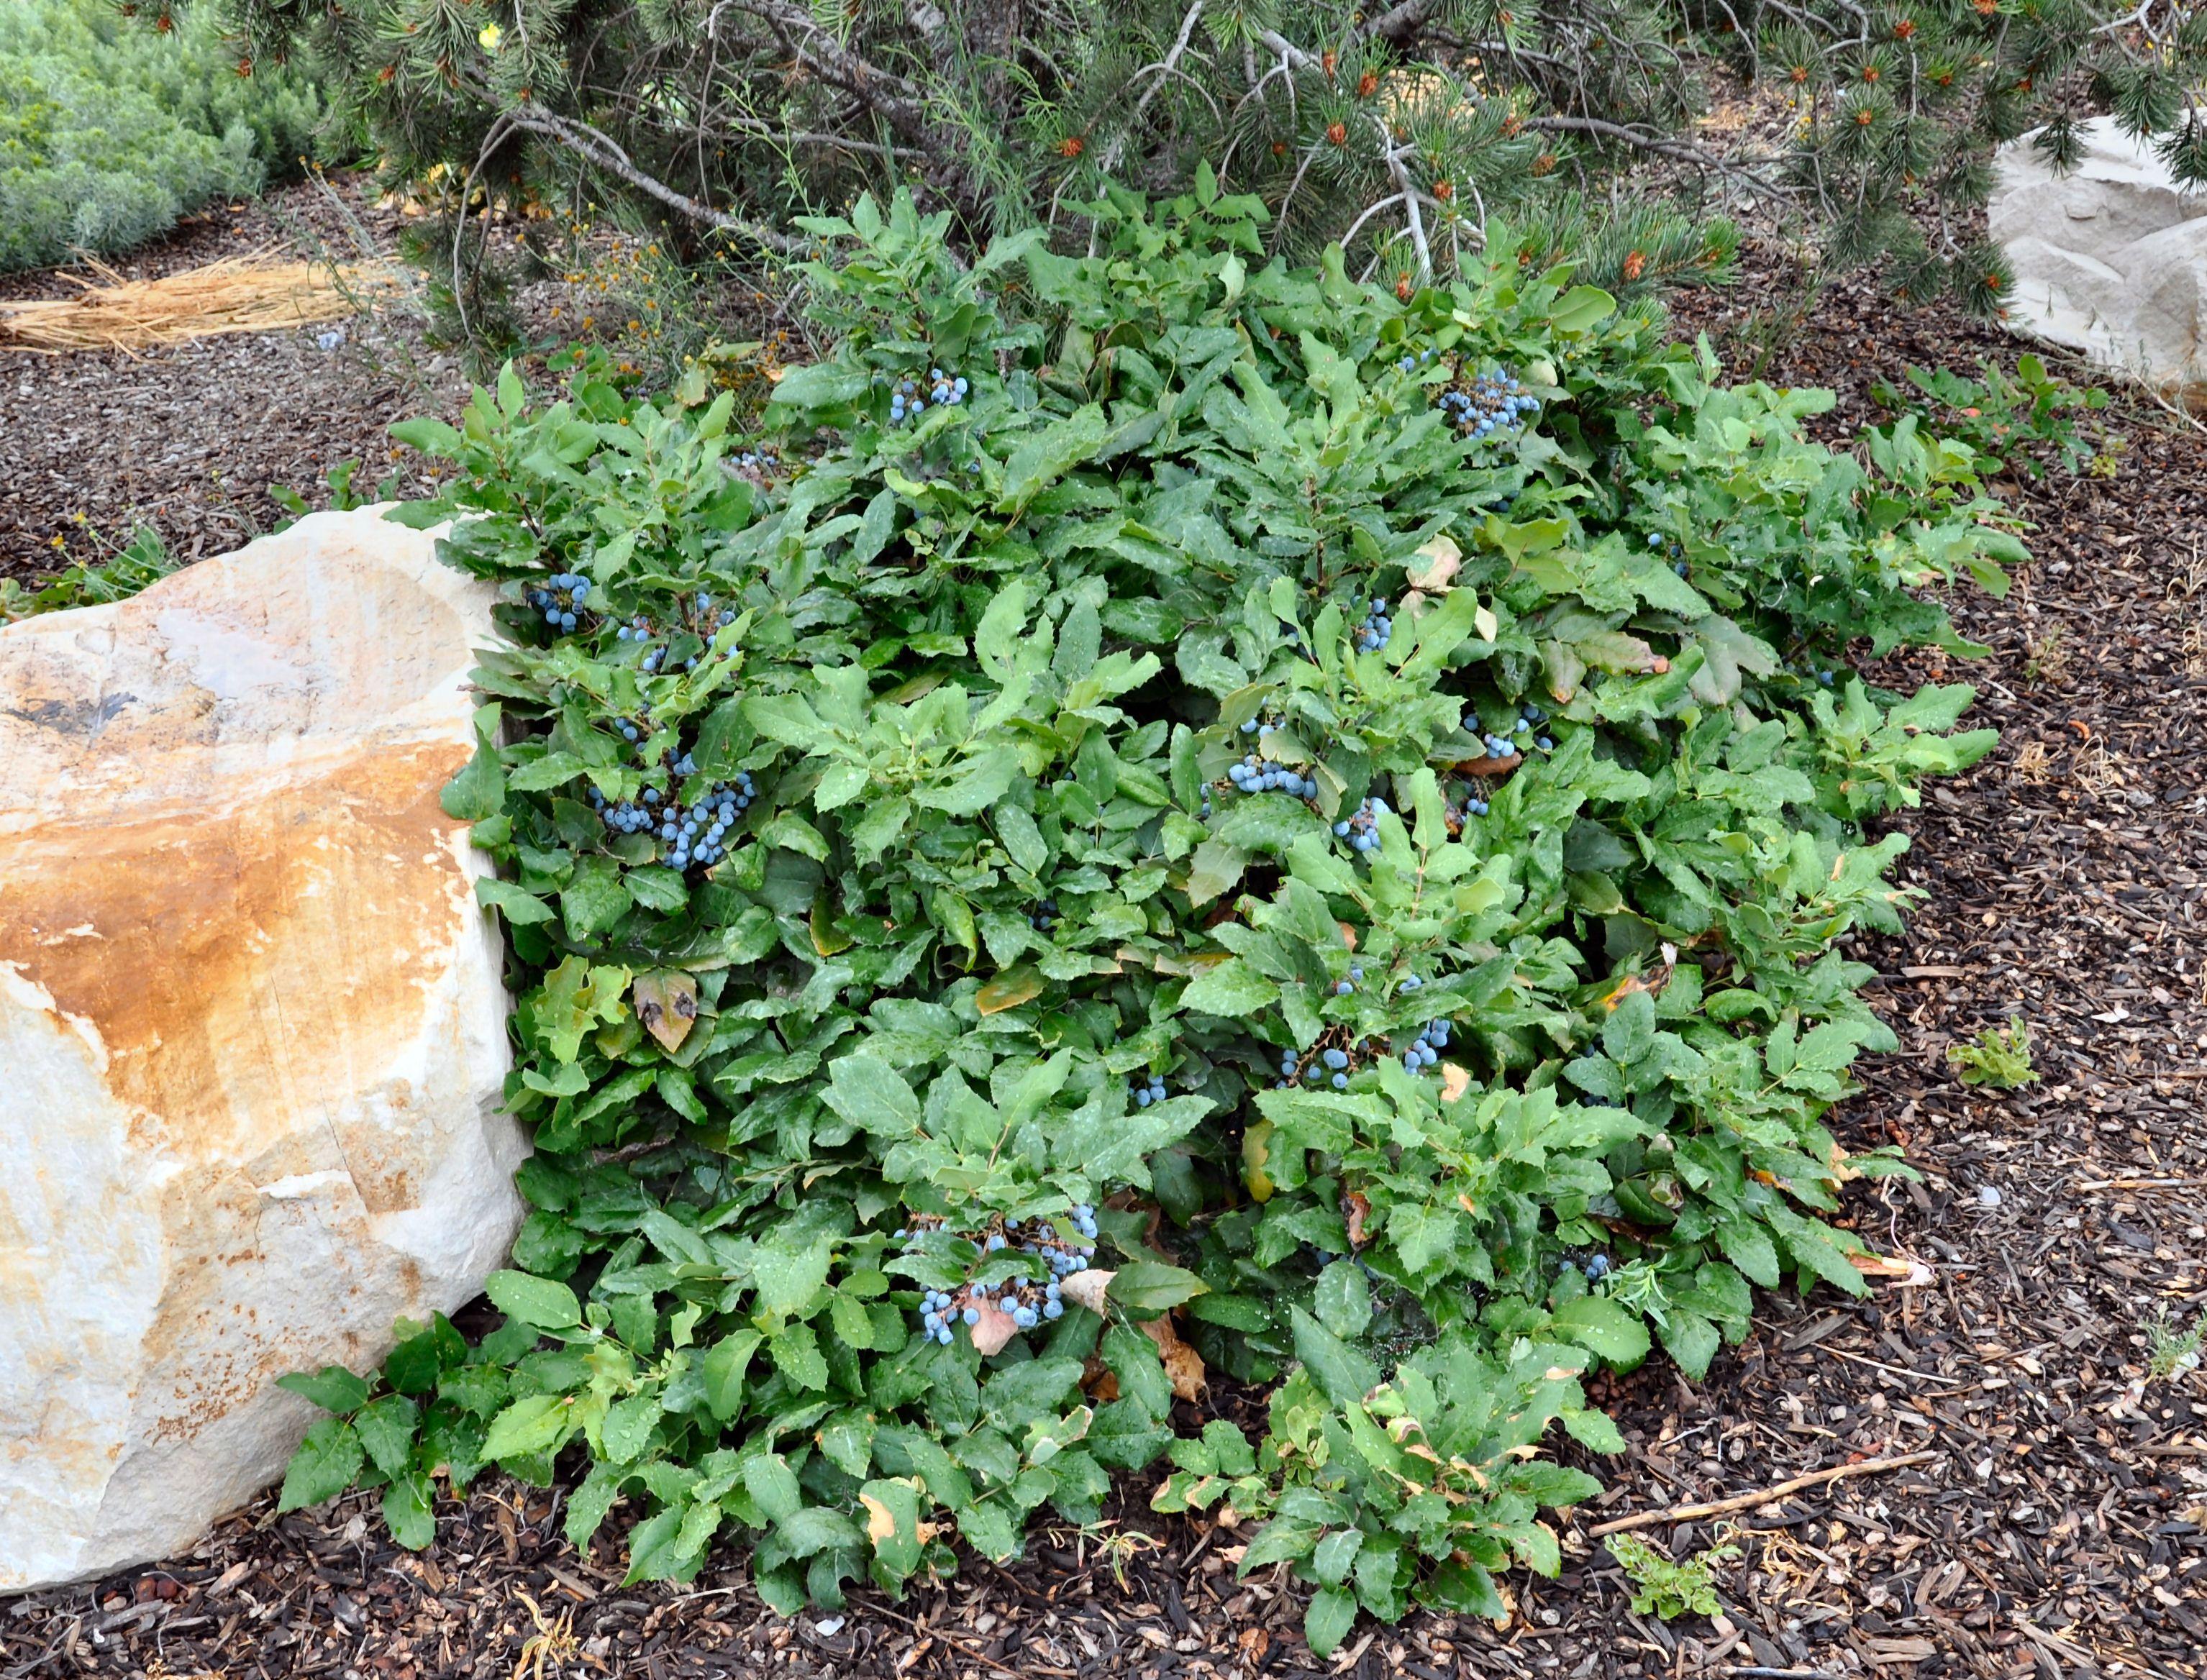 Mahonia Aquifolium Compacta Dwarf Oregon Grape Zone 5 H 5 7ft S